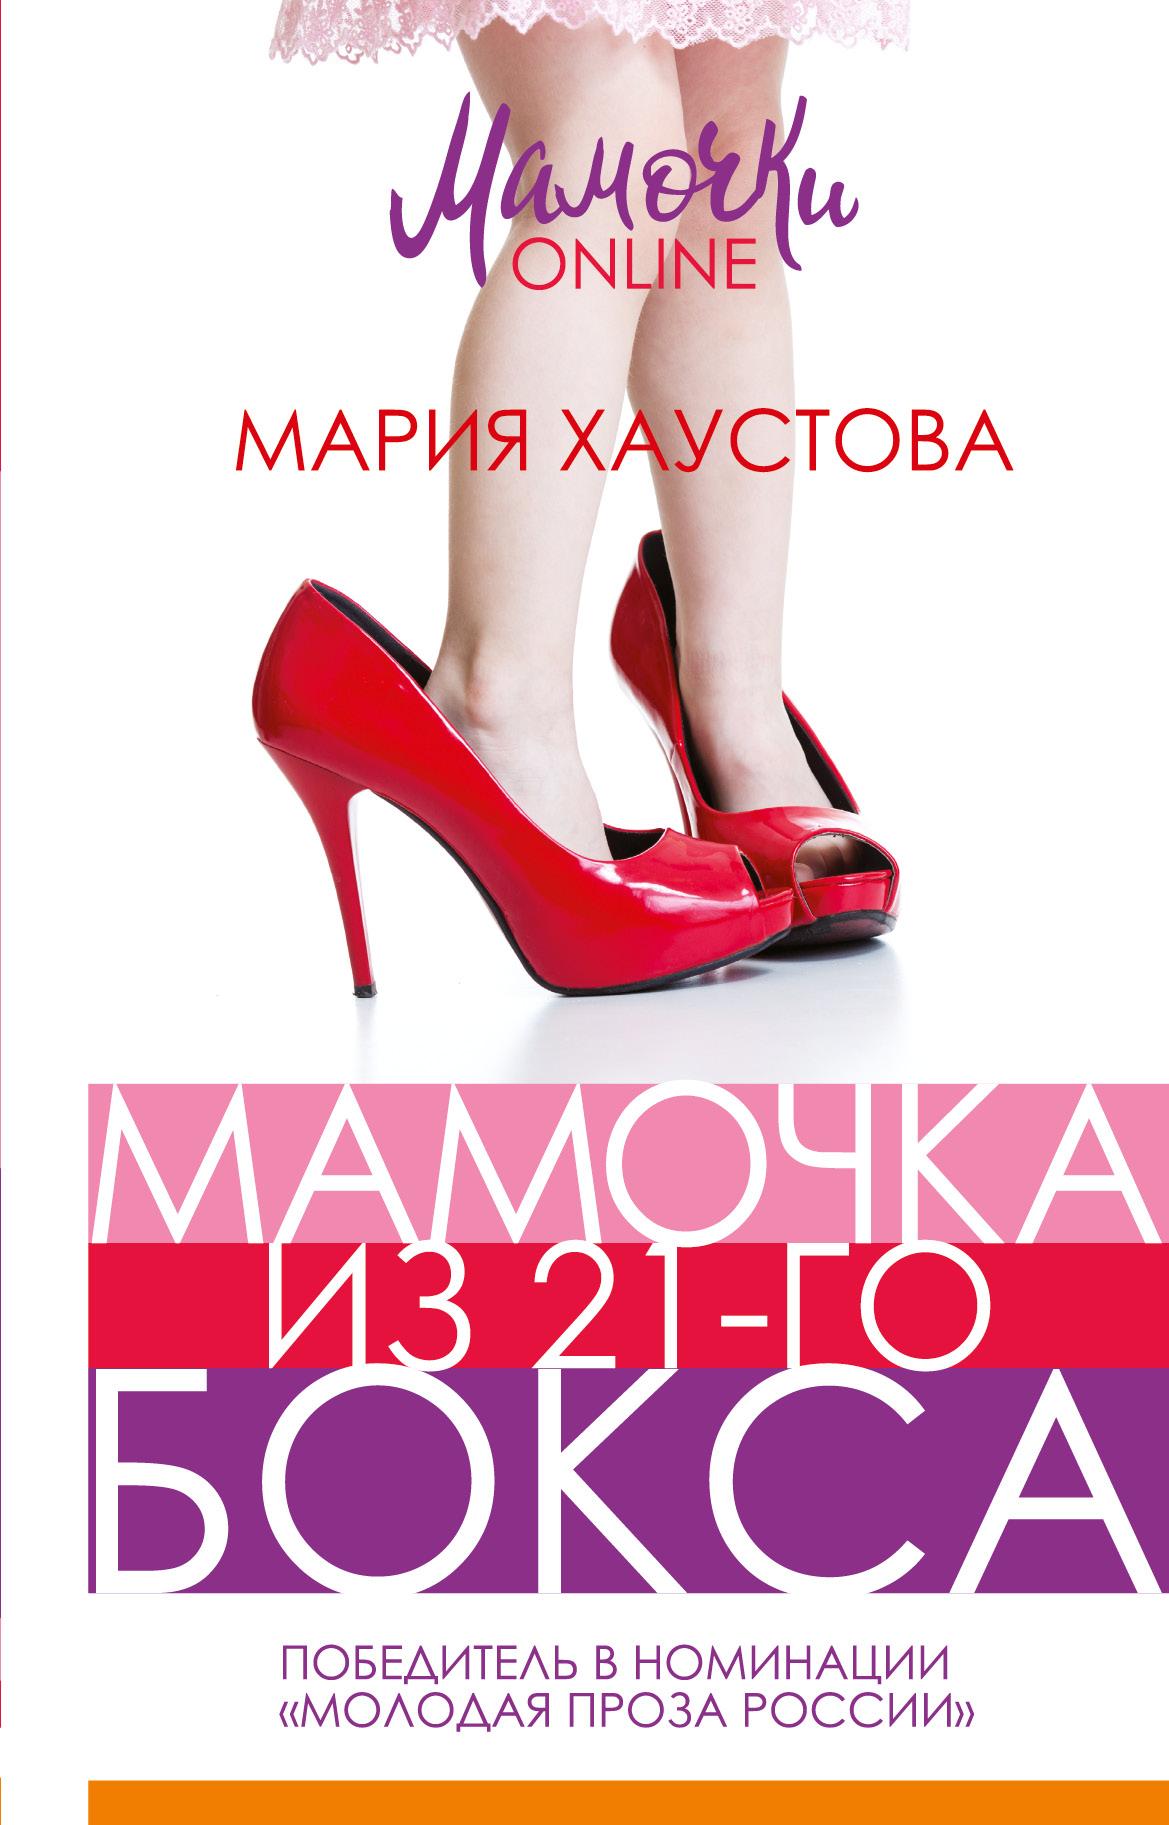 Zakazat.ru: Мамочка из 21-го бокса. Хаустова Мария Александровна